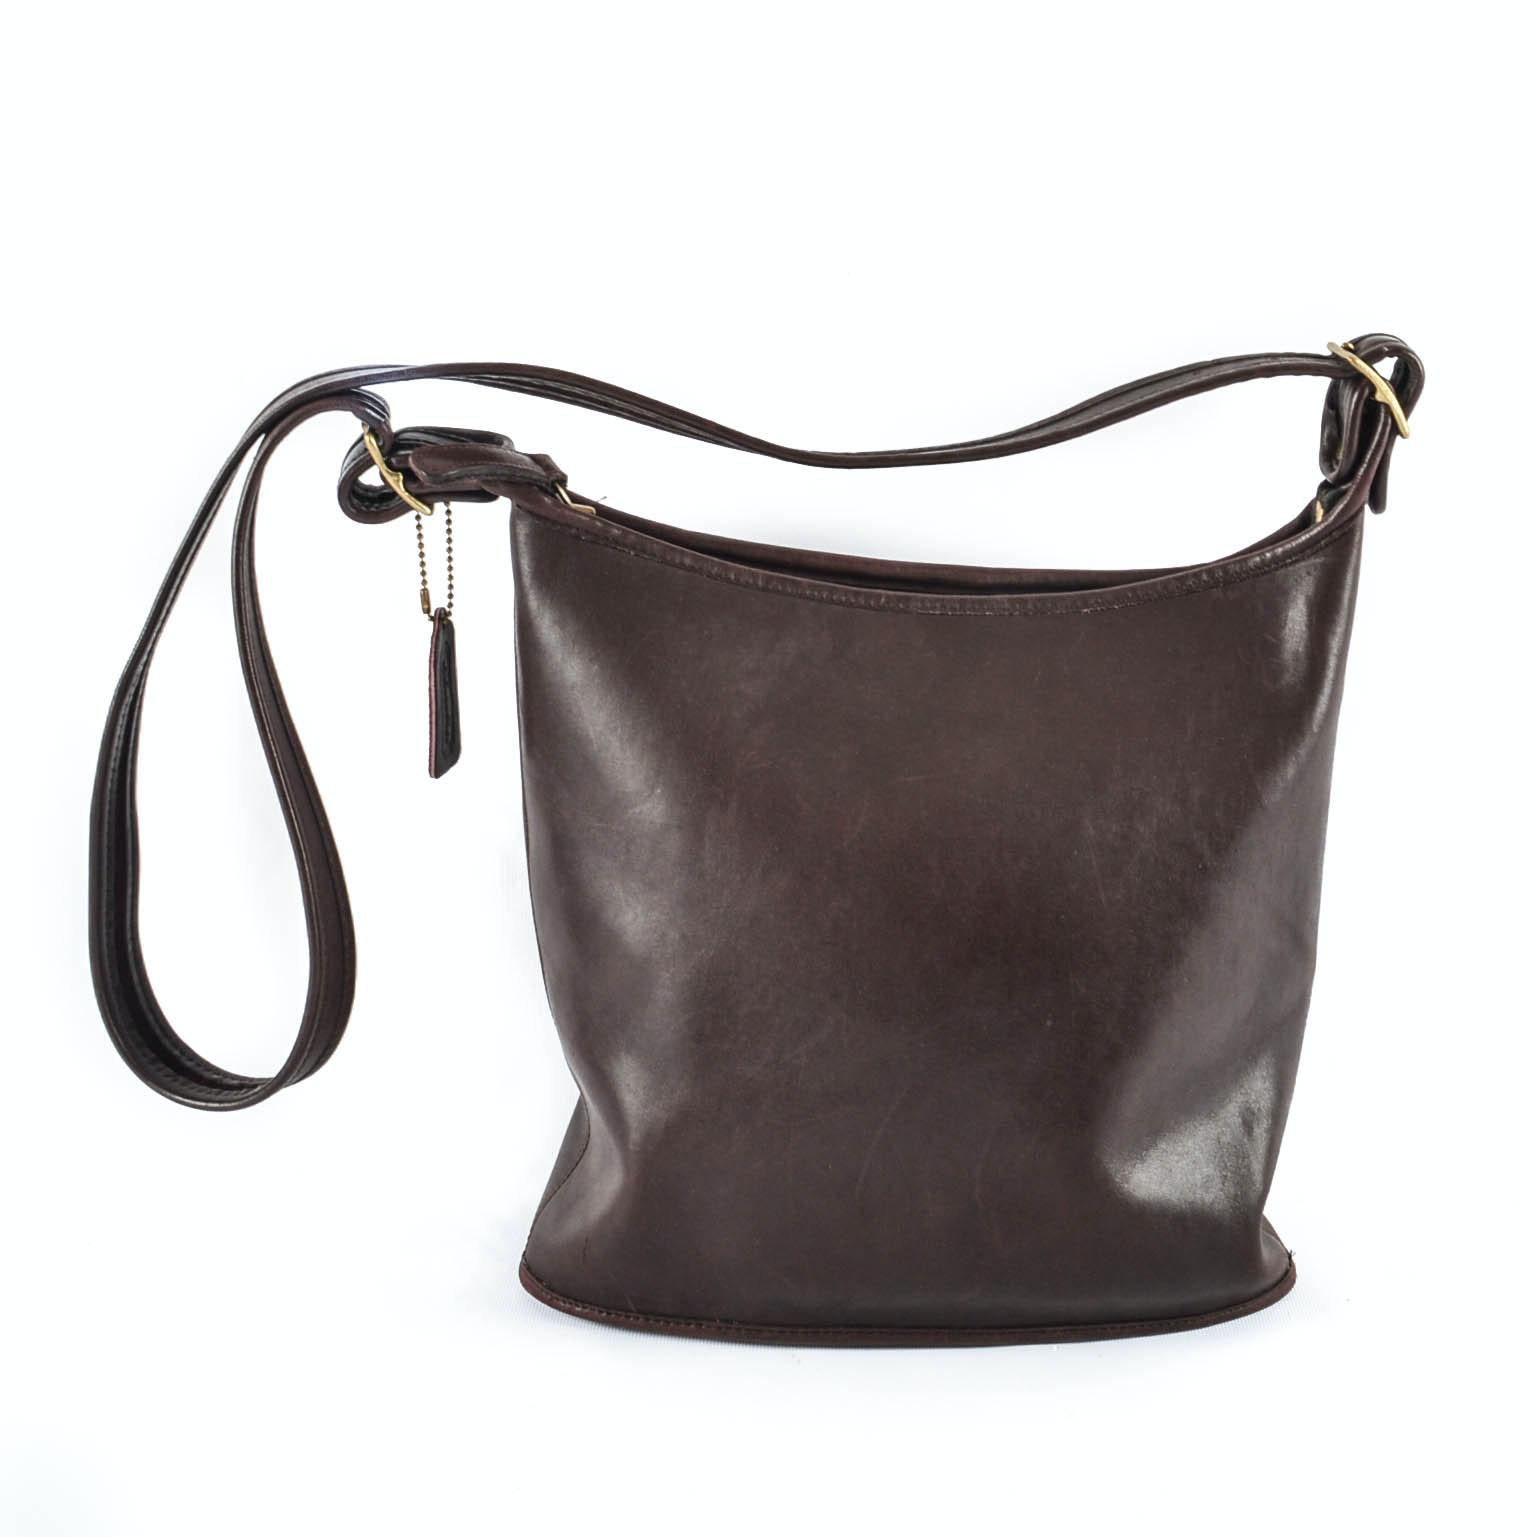 Vintage Coach Leather Legacy Bucket Bag